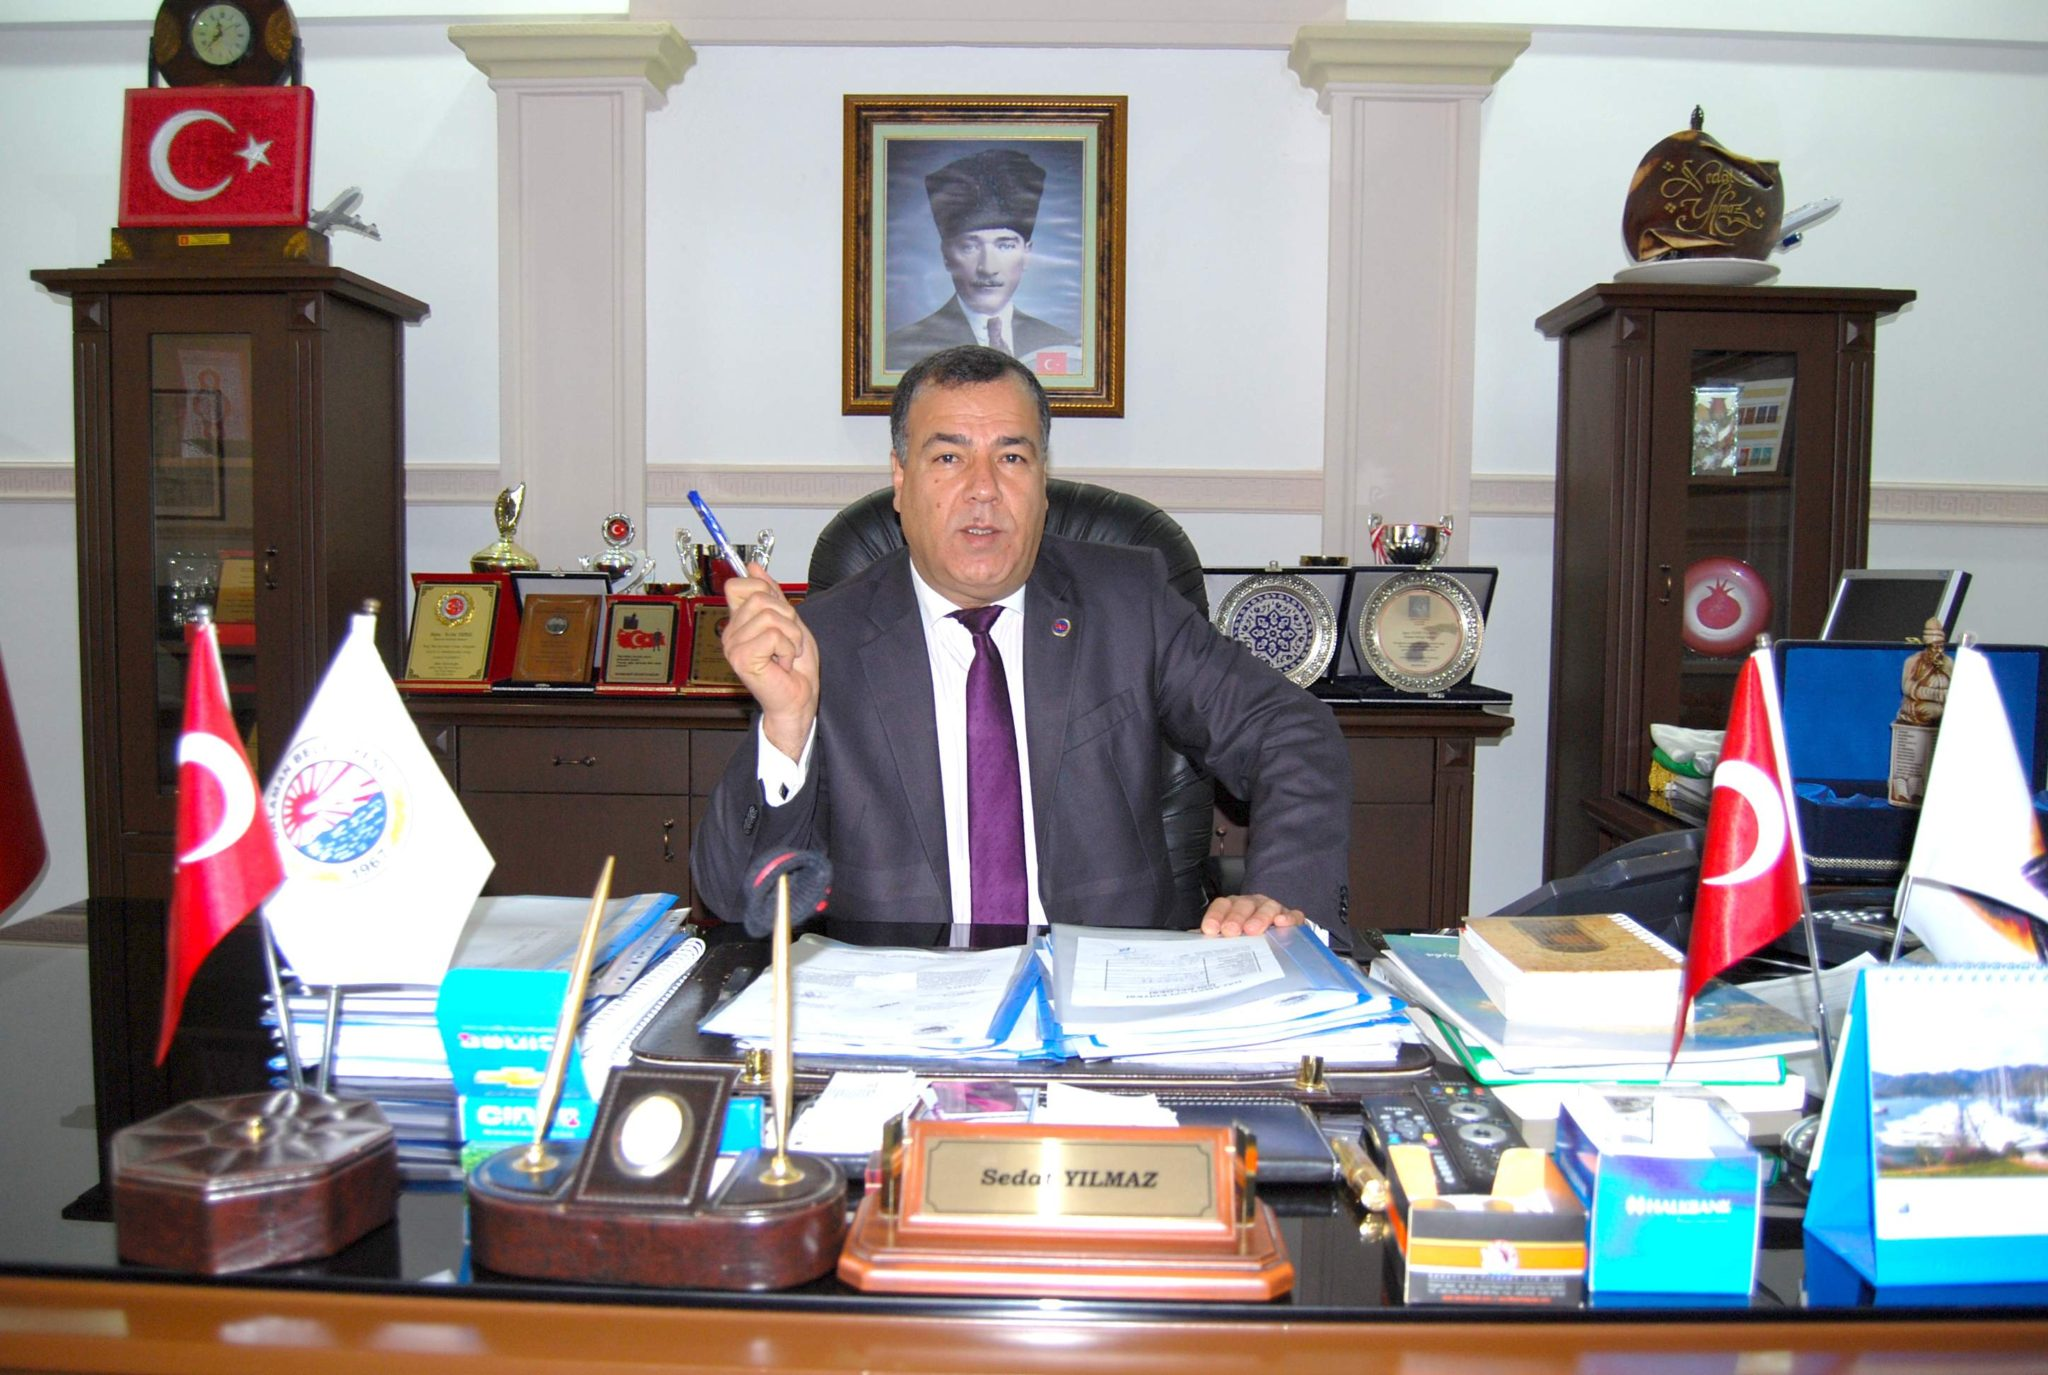 Dalaman Belediye Baskani Sedat Yilmaz Lafla Peynir Gemisi